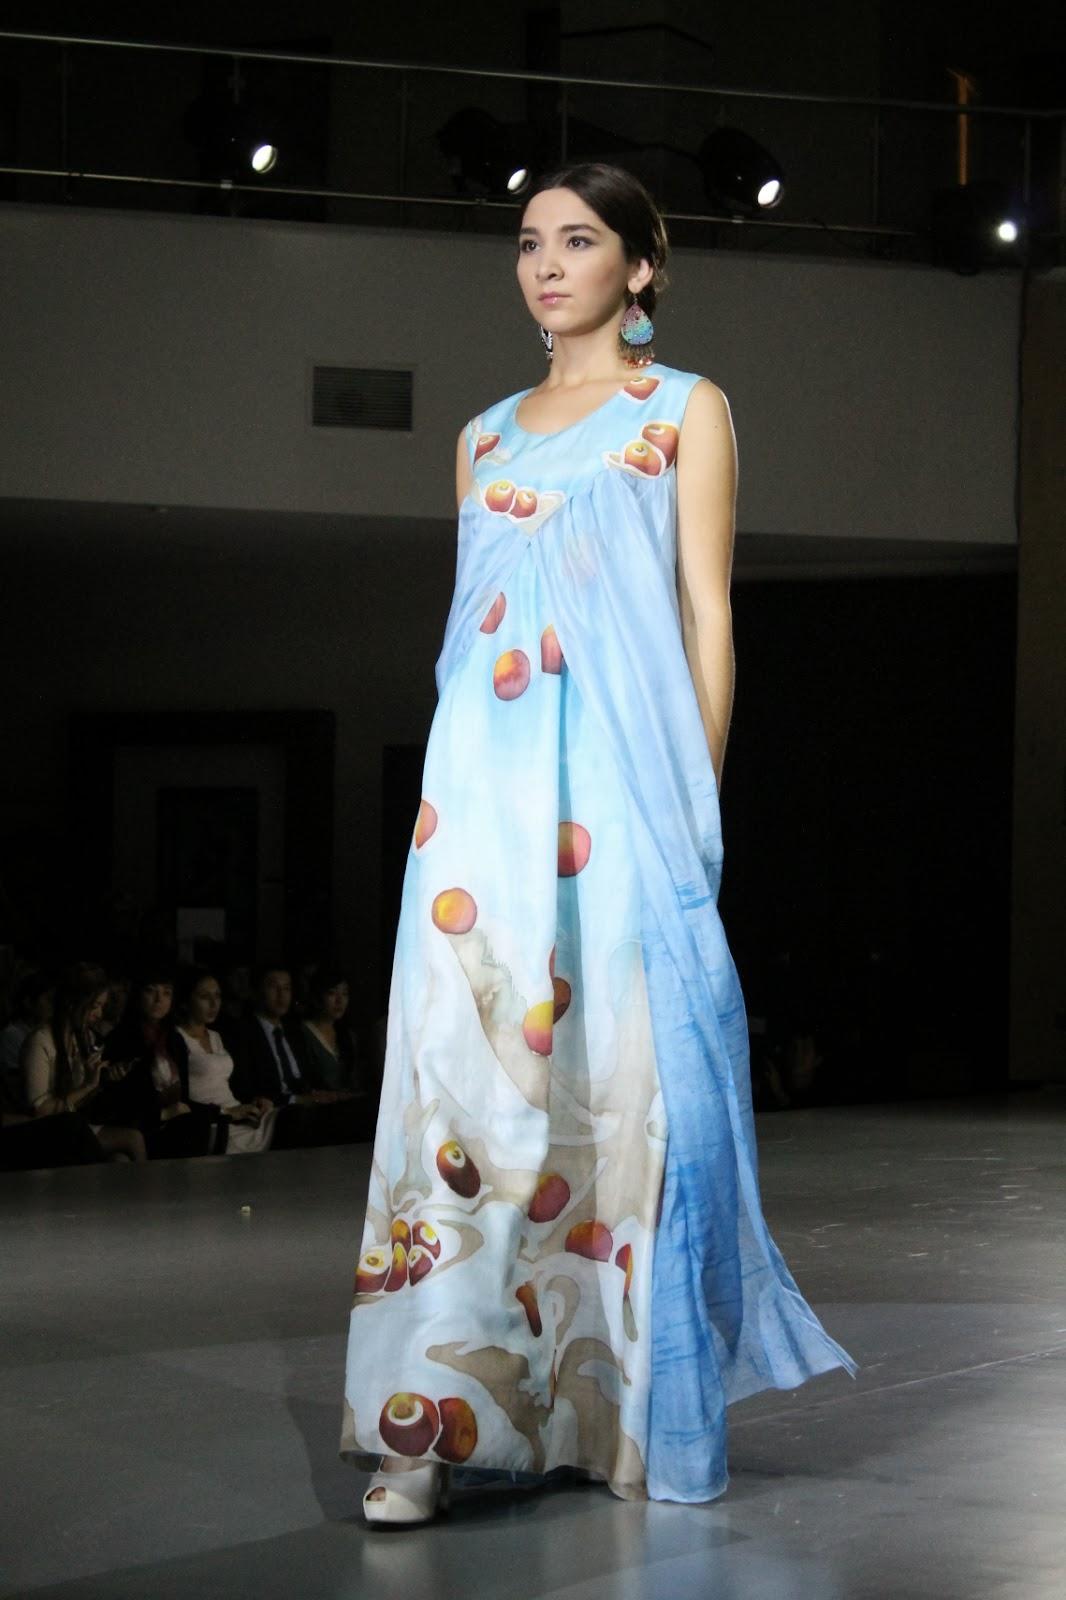 Мода узбек миллий либослари фото